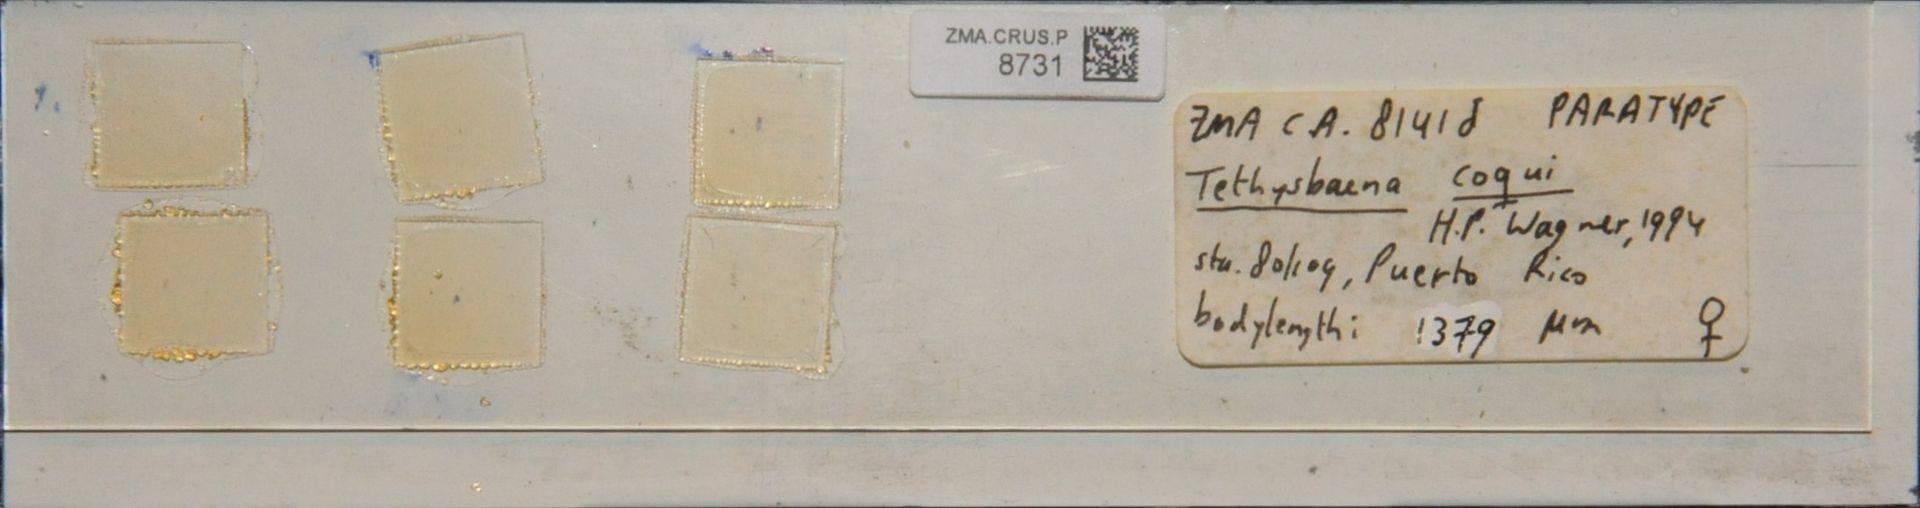 ZMA.CRUS.P.8731   Tethysbaena coqui H.P. Wagner, 1994